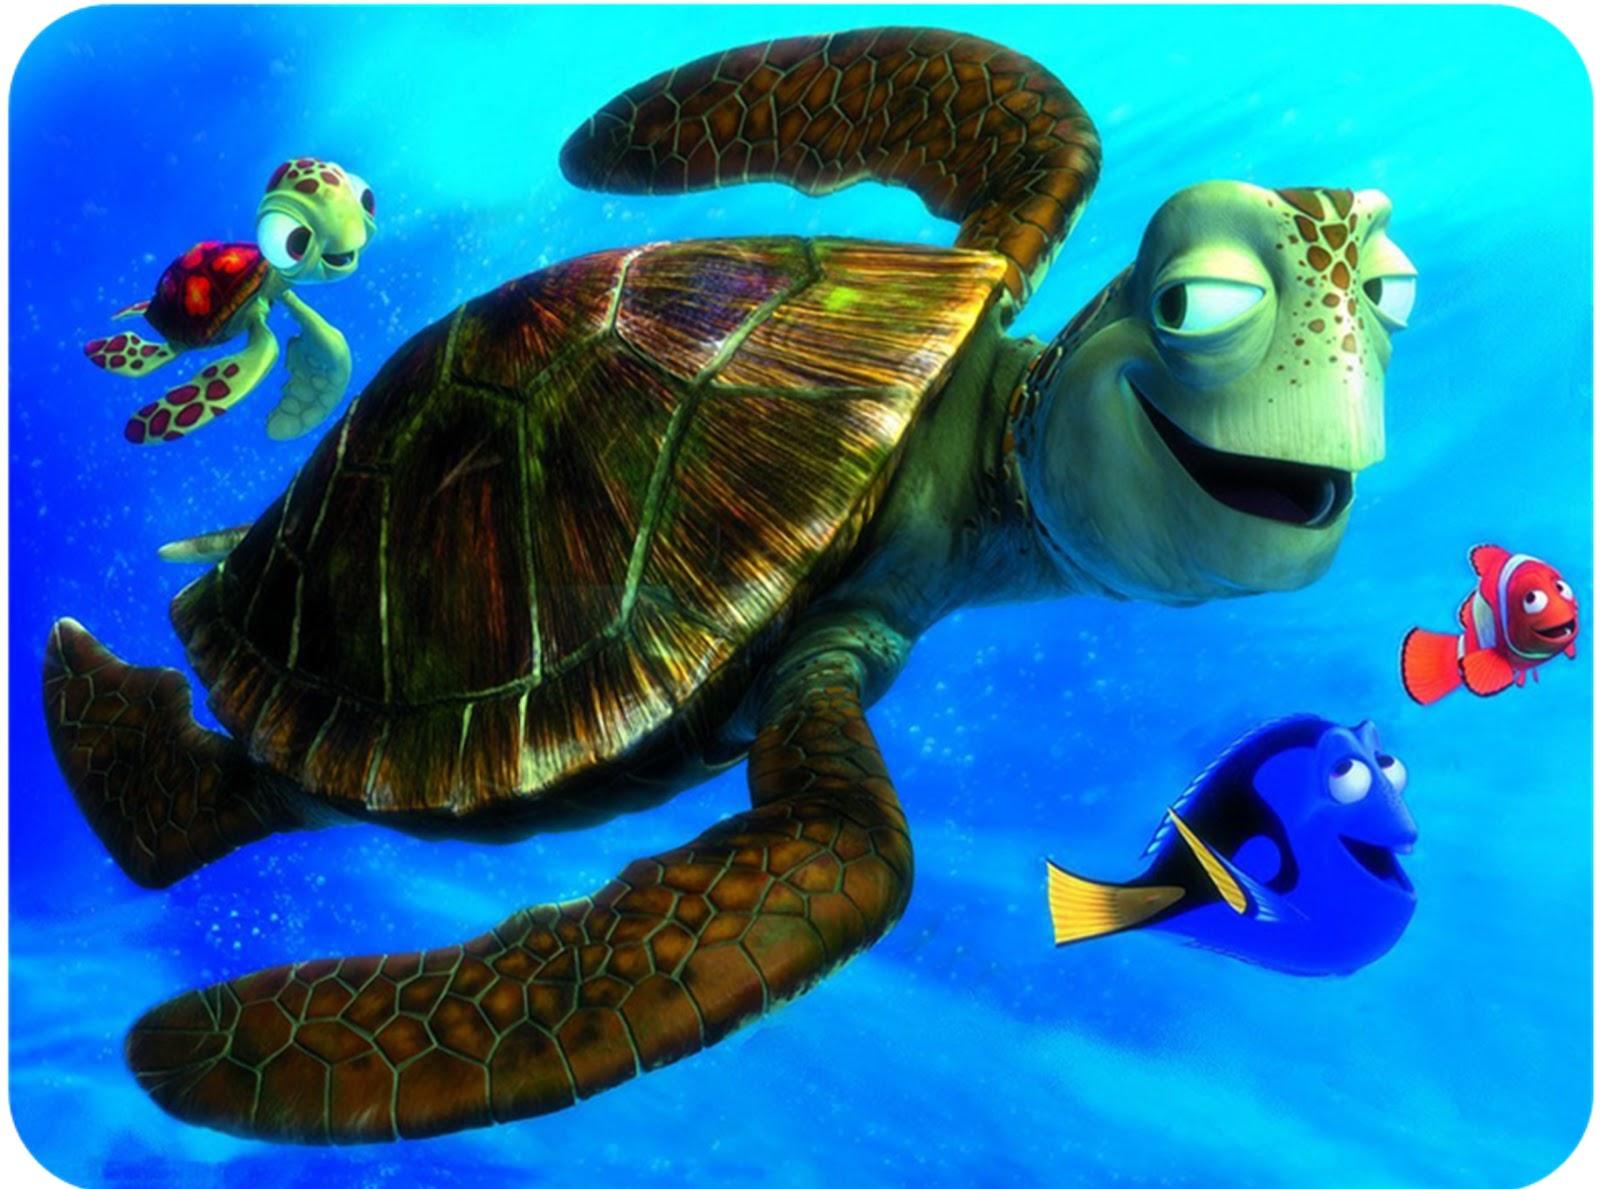 Animated Movies | Animated Movies Wallpapers | Animated ...